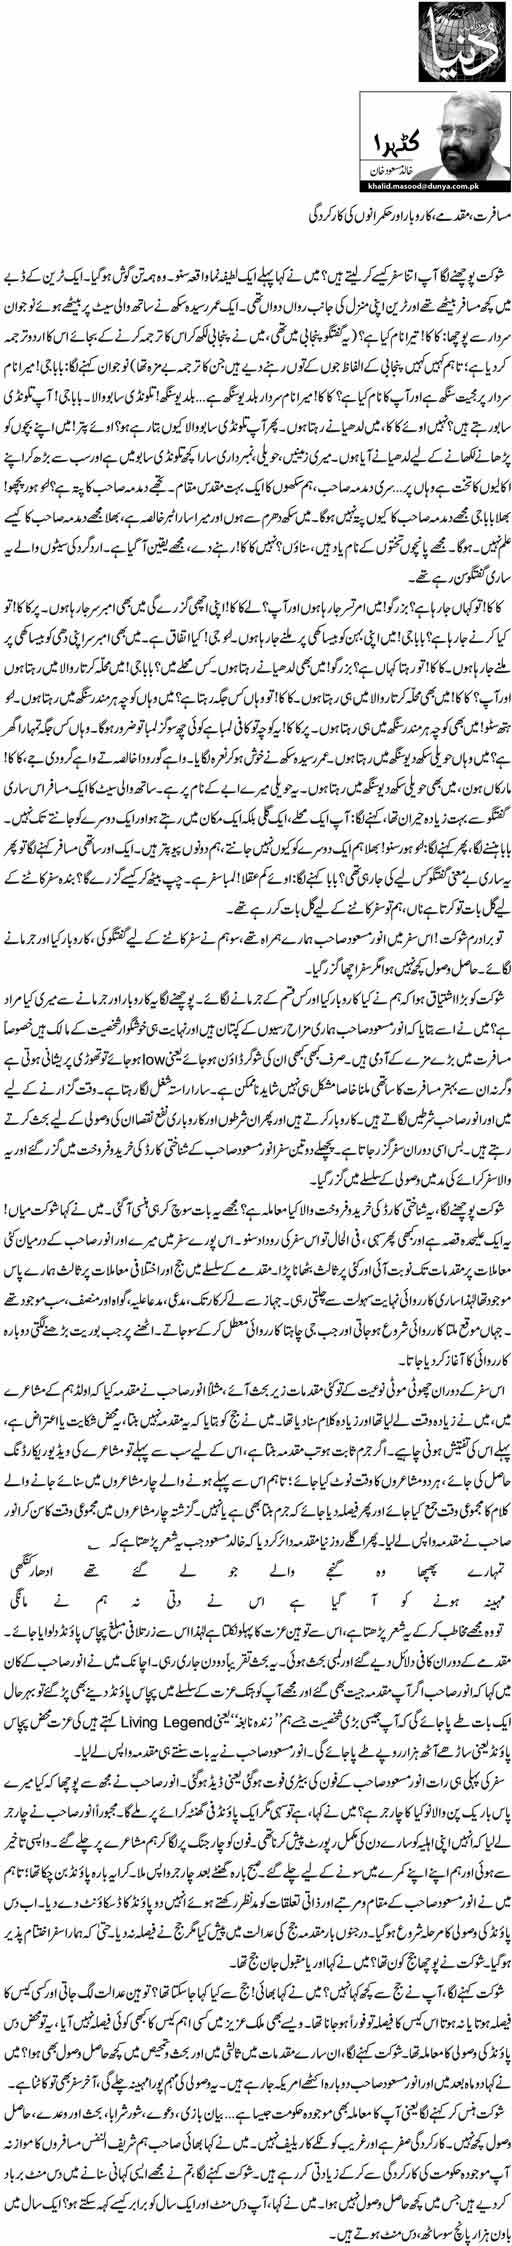 Musafrat, Muqadmay, Karobar Aur Hukmarano Ki Karkardgi - Khalid Masood Khan